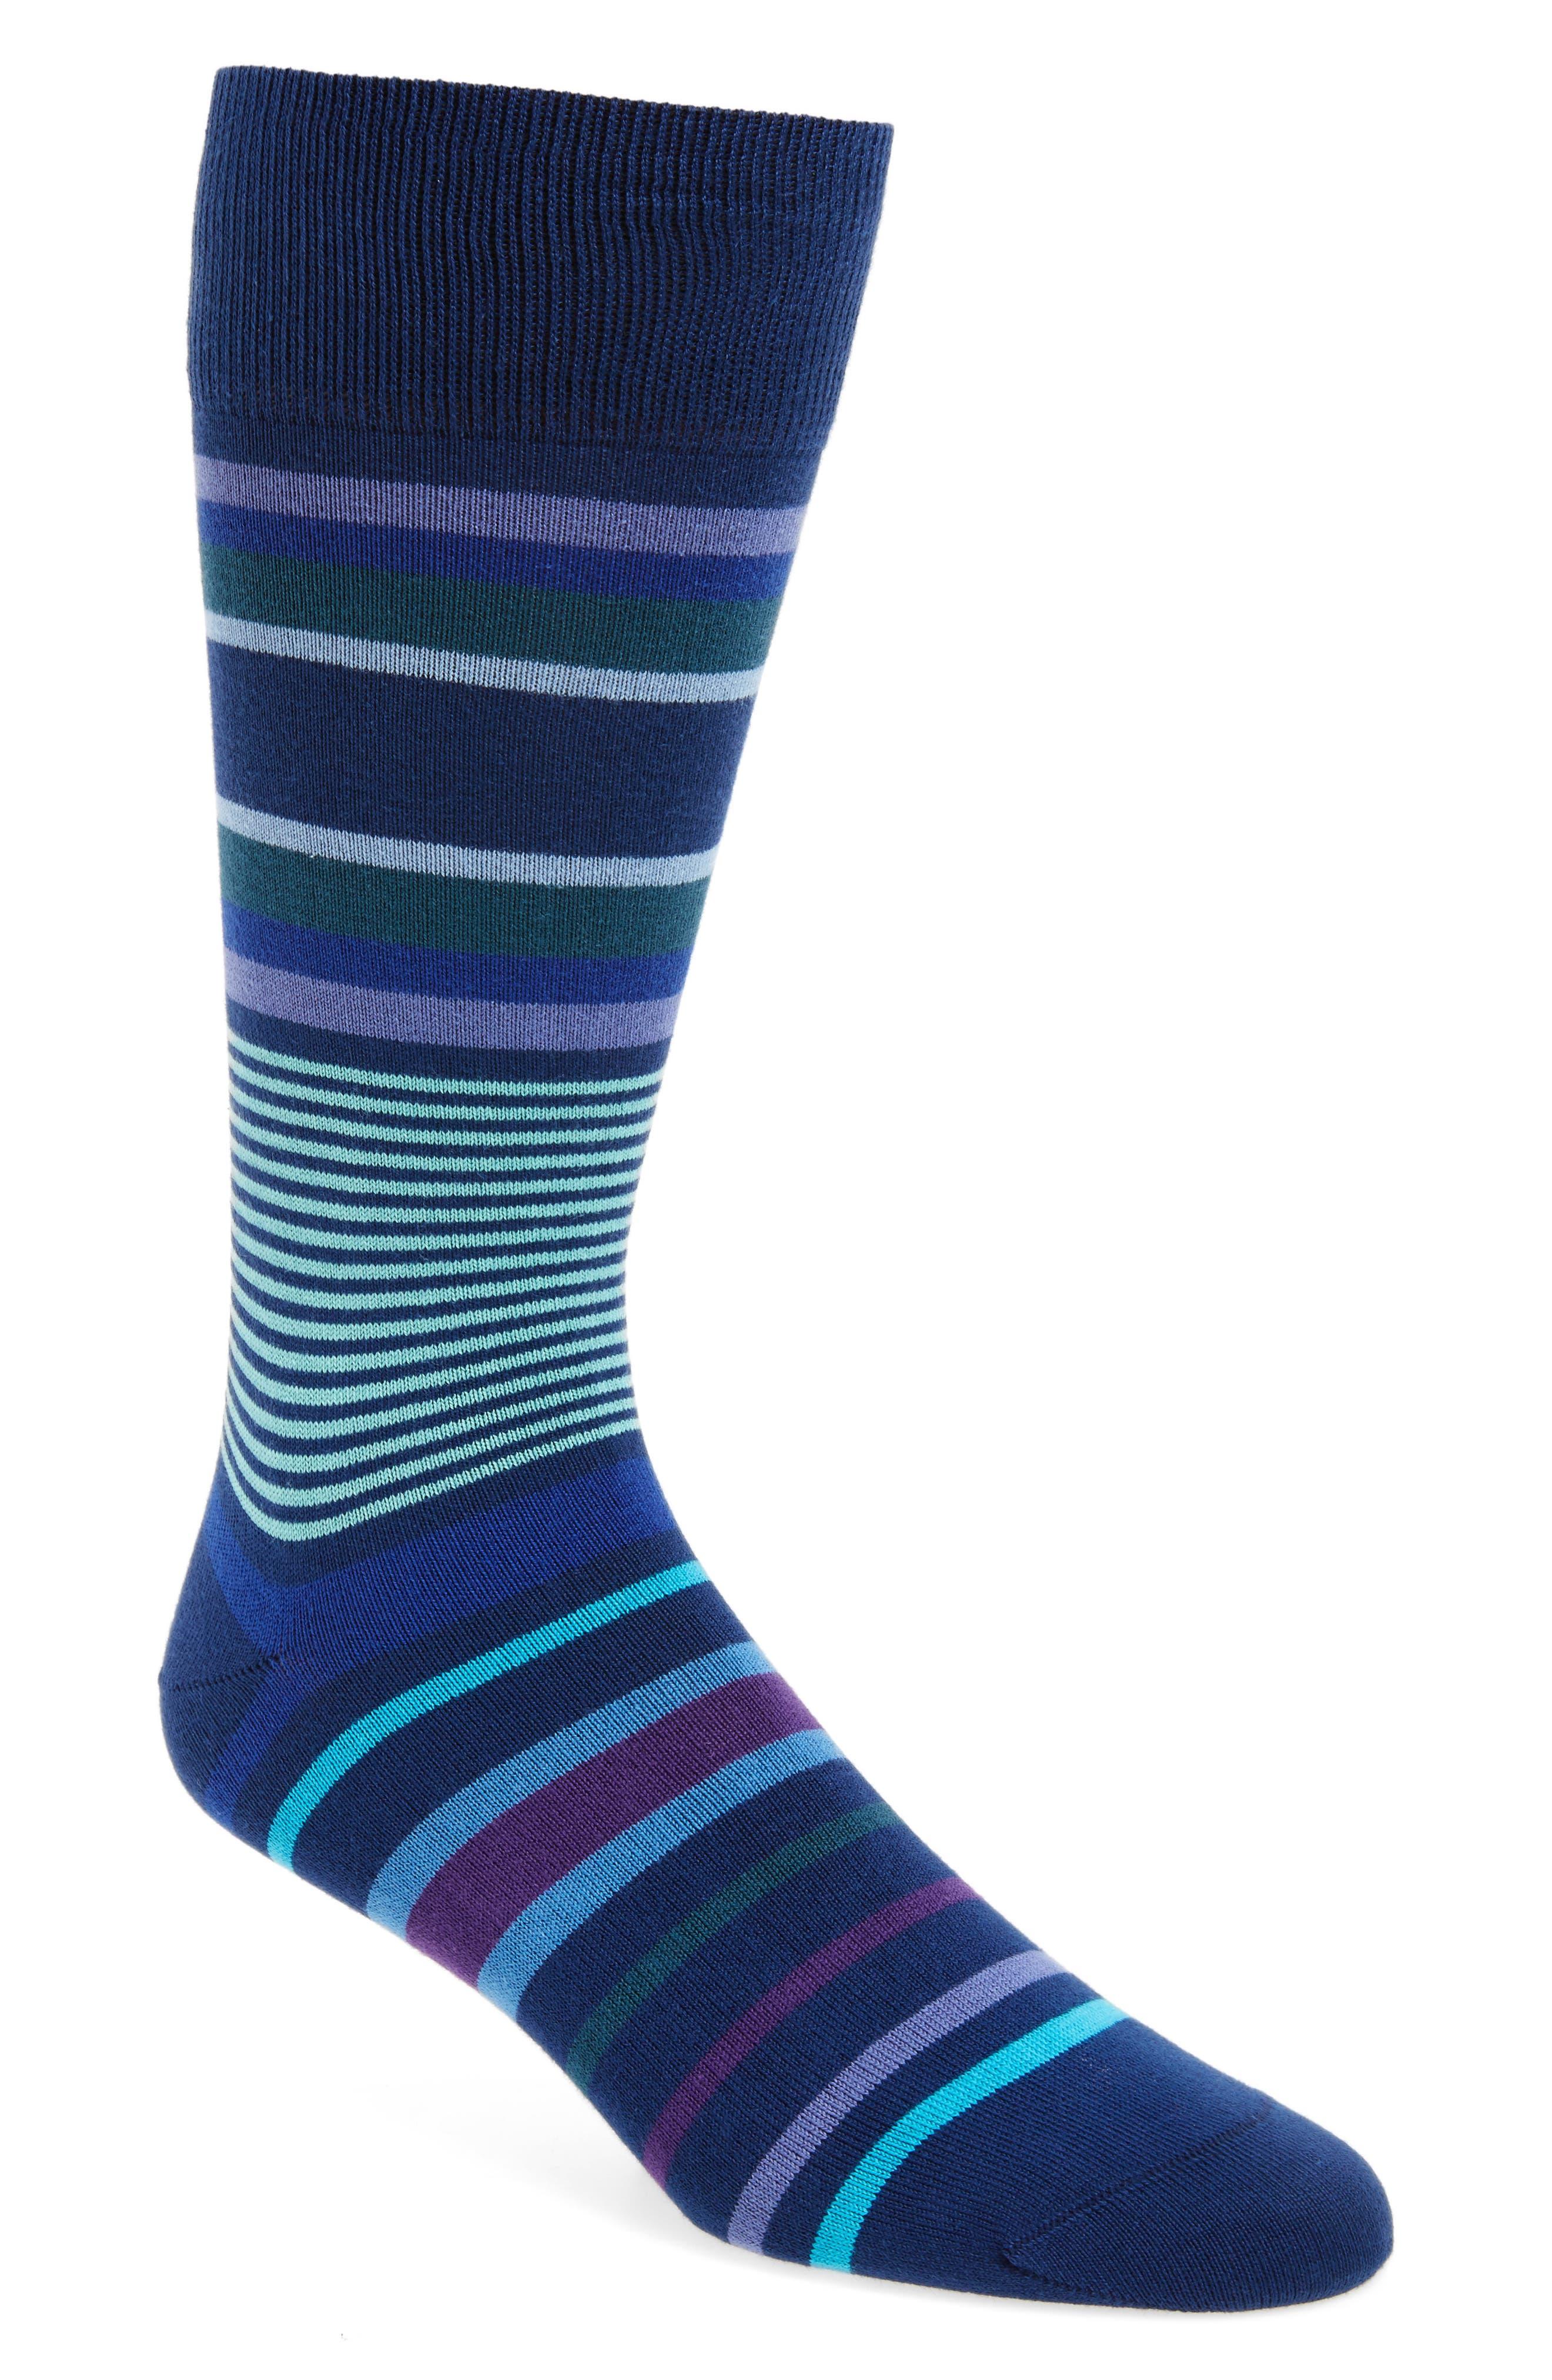 Lawn Stripe Socks,                             Main thumbnail 1, color,                             400